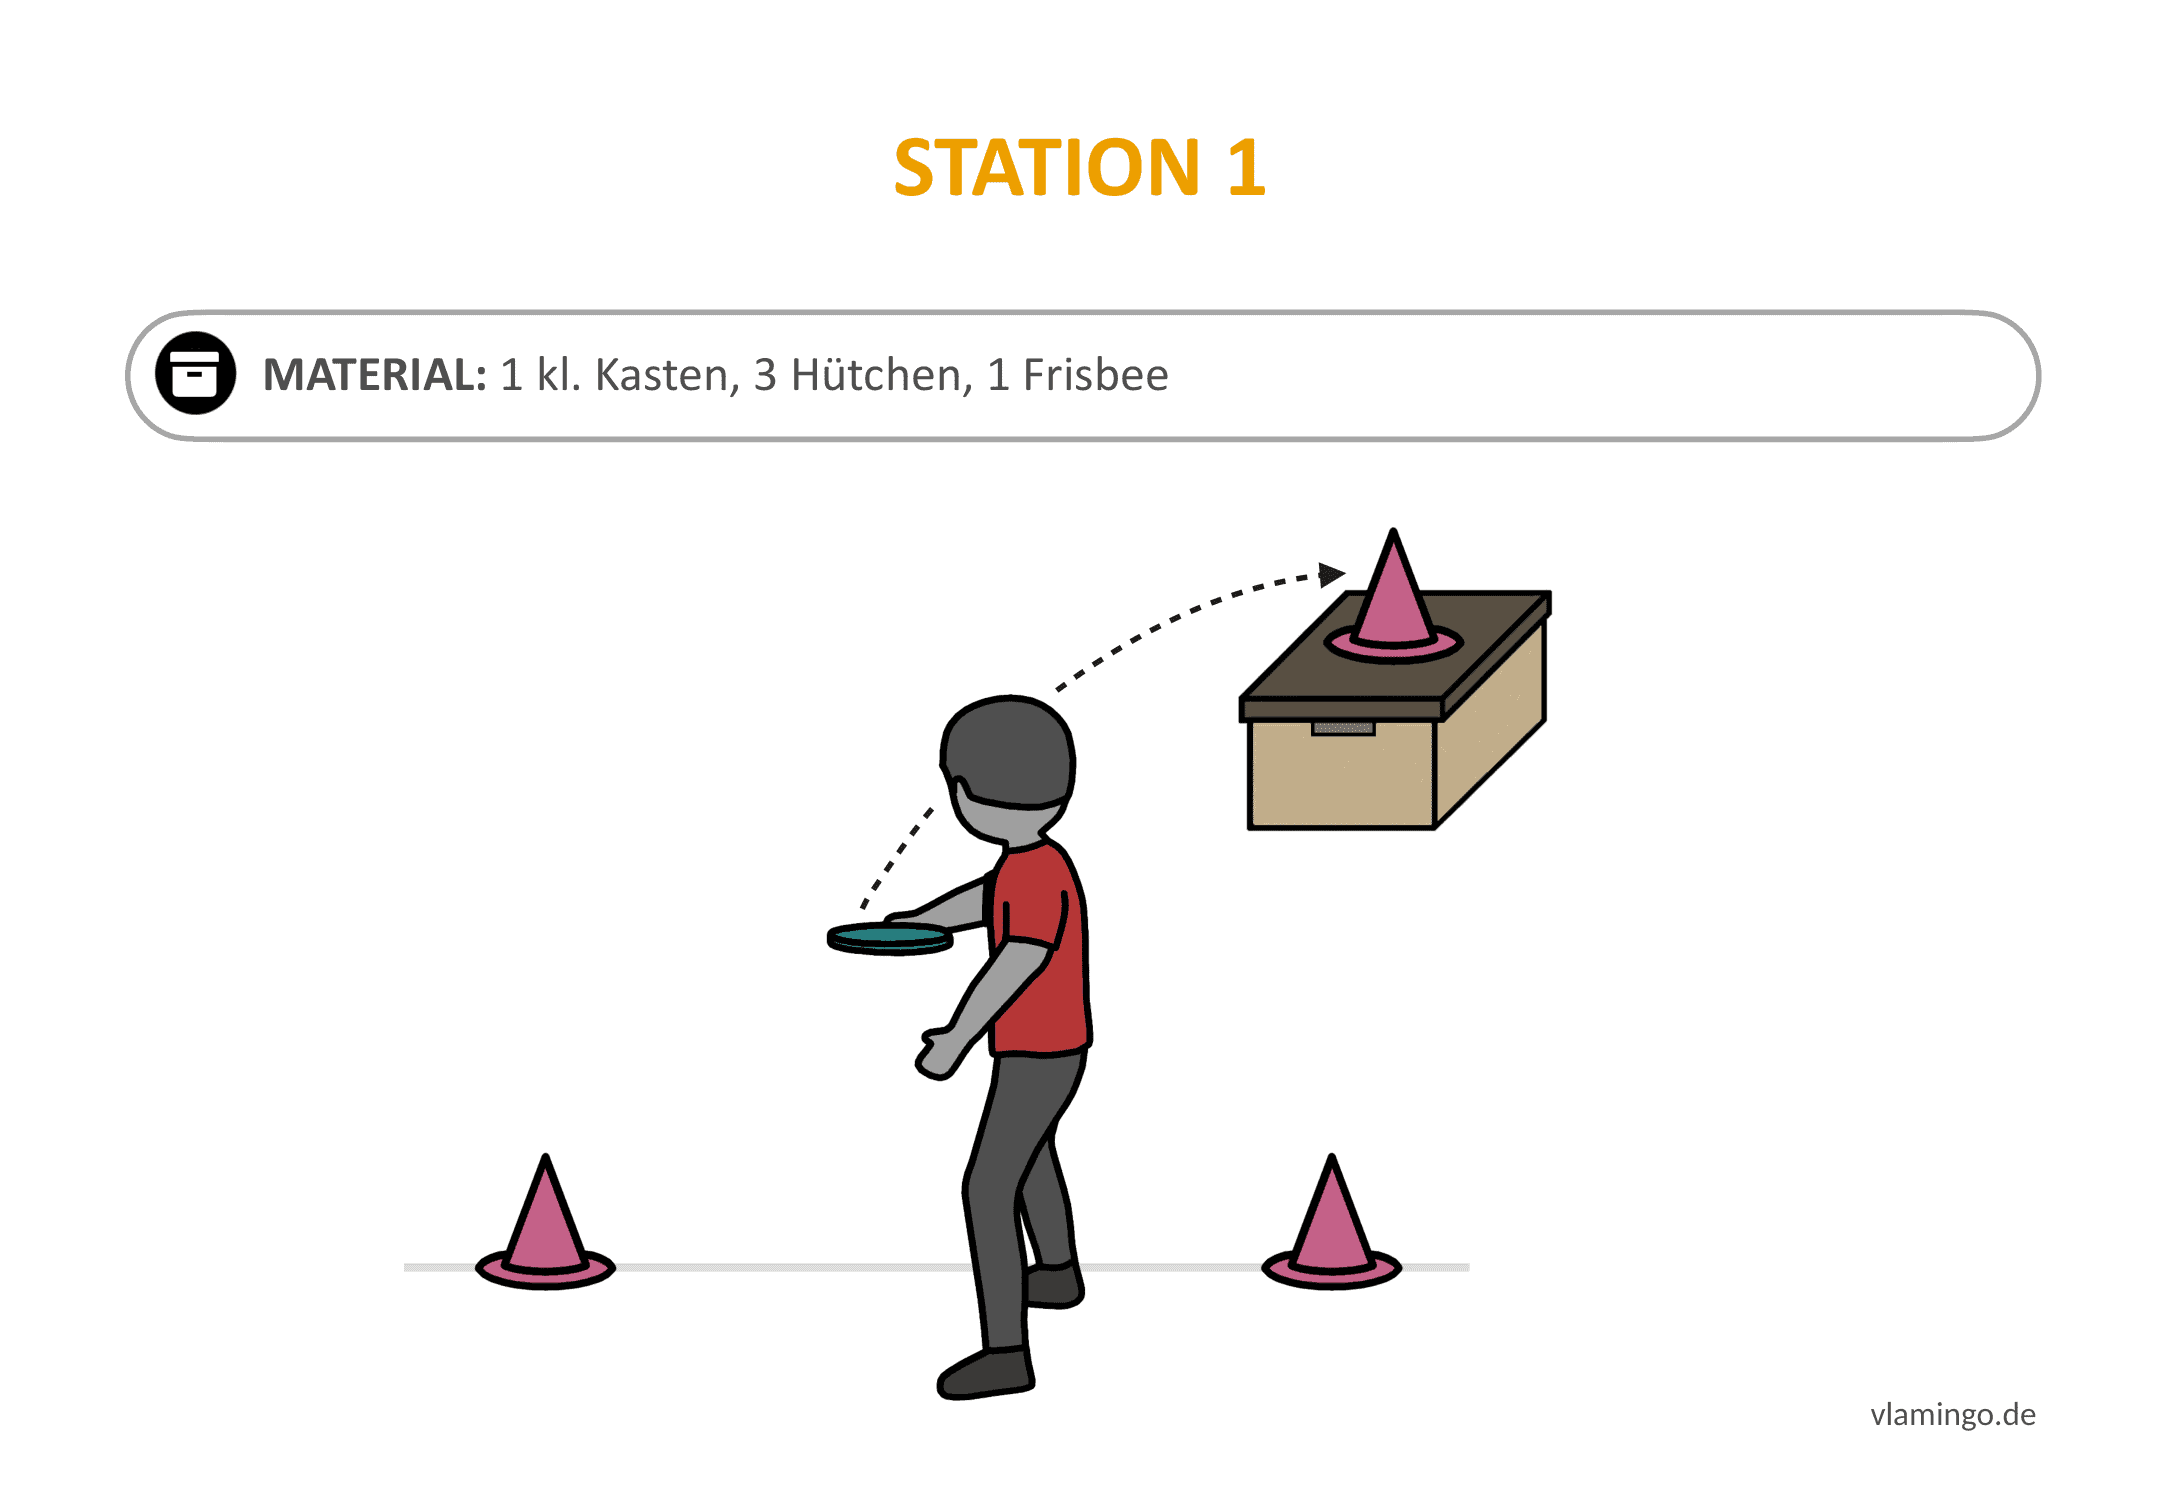 Frisbeegolf (Disc-Golf) - Station 1